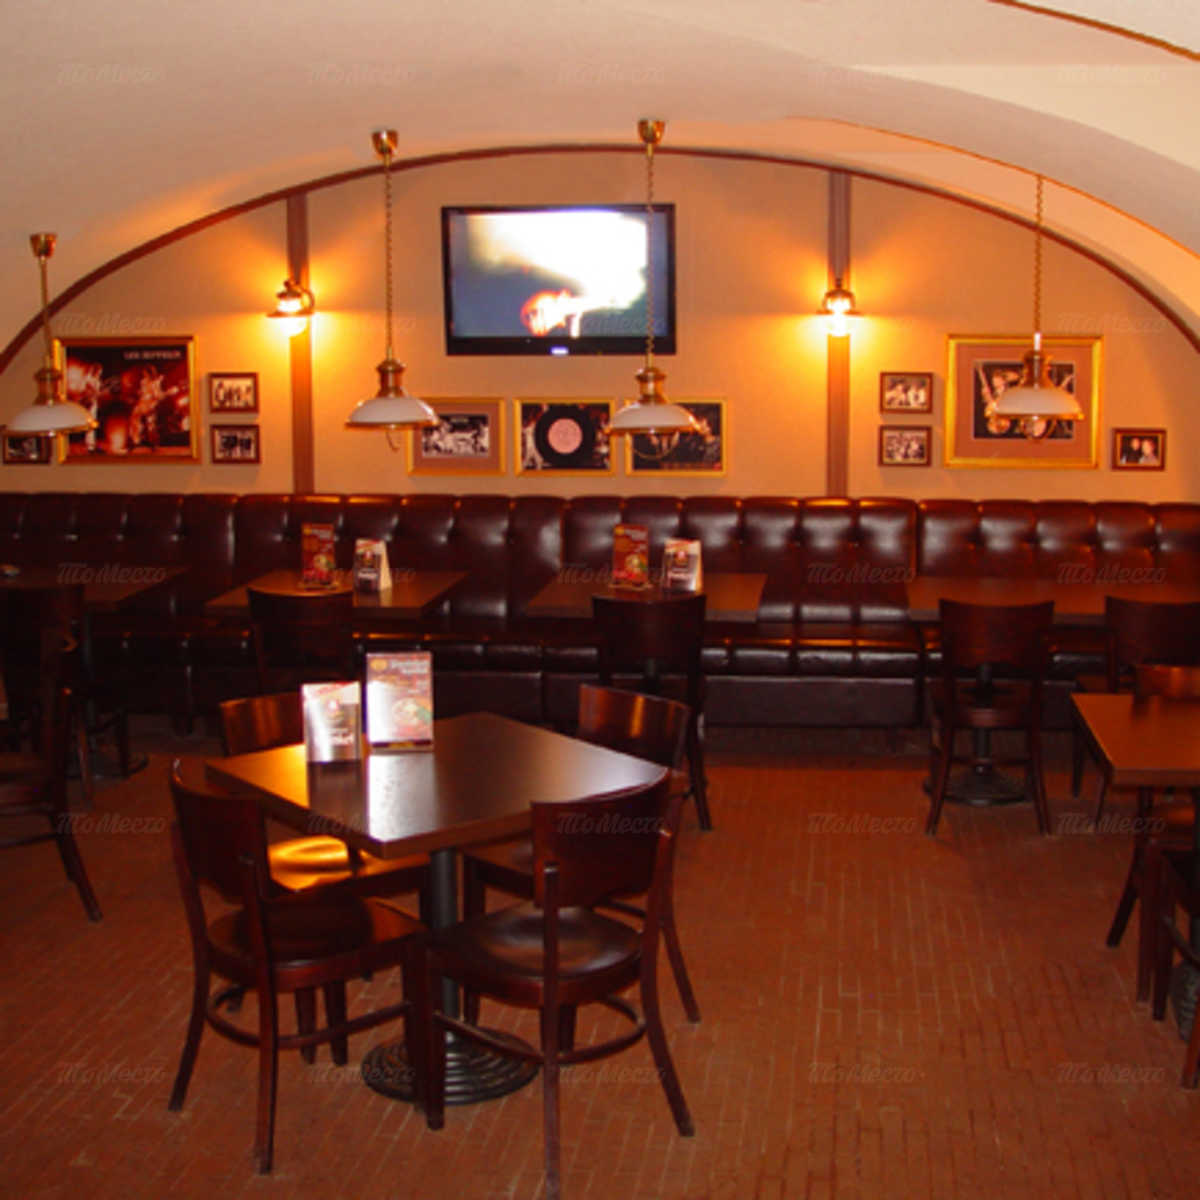 Паб Рок паб (Rock Pub) на Невском проспекте фото 5